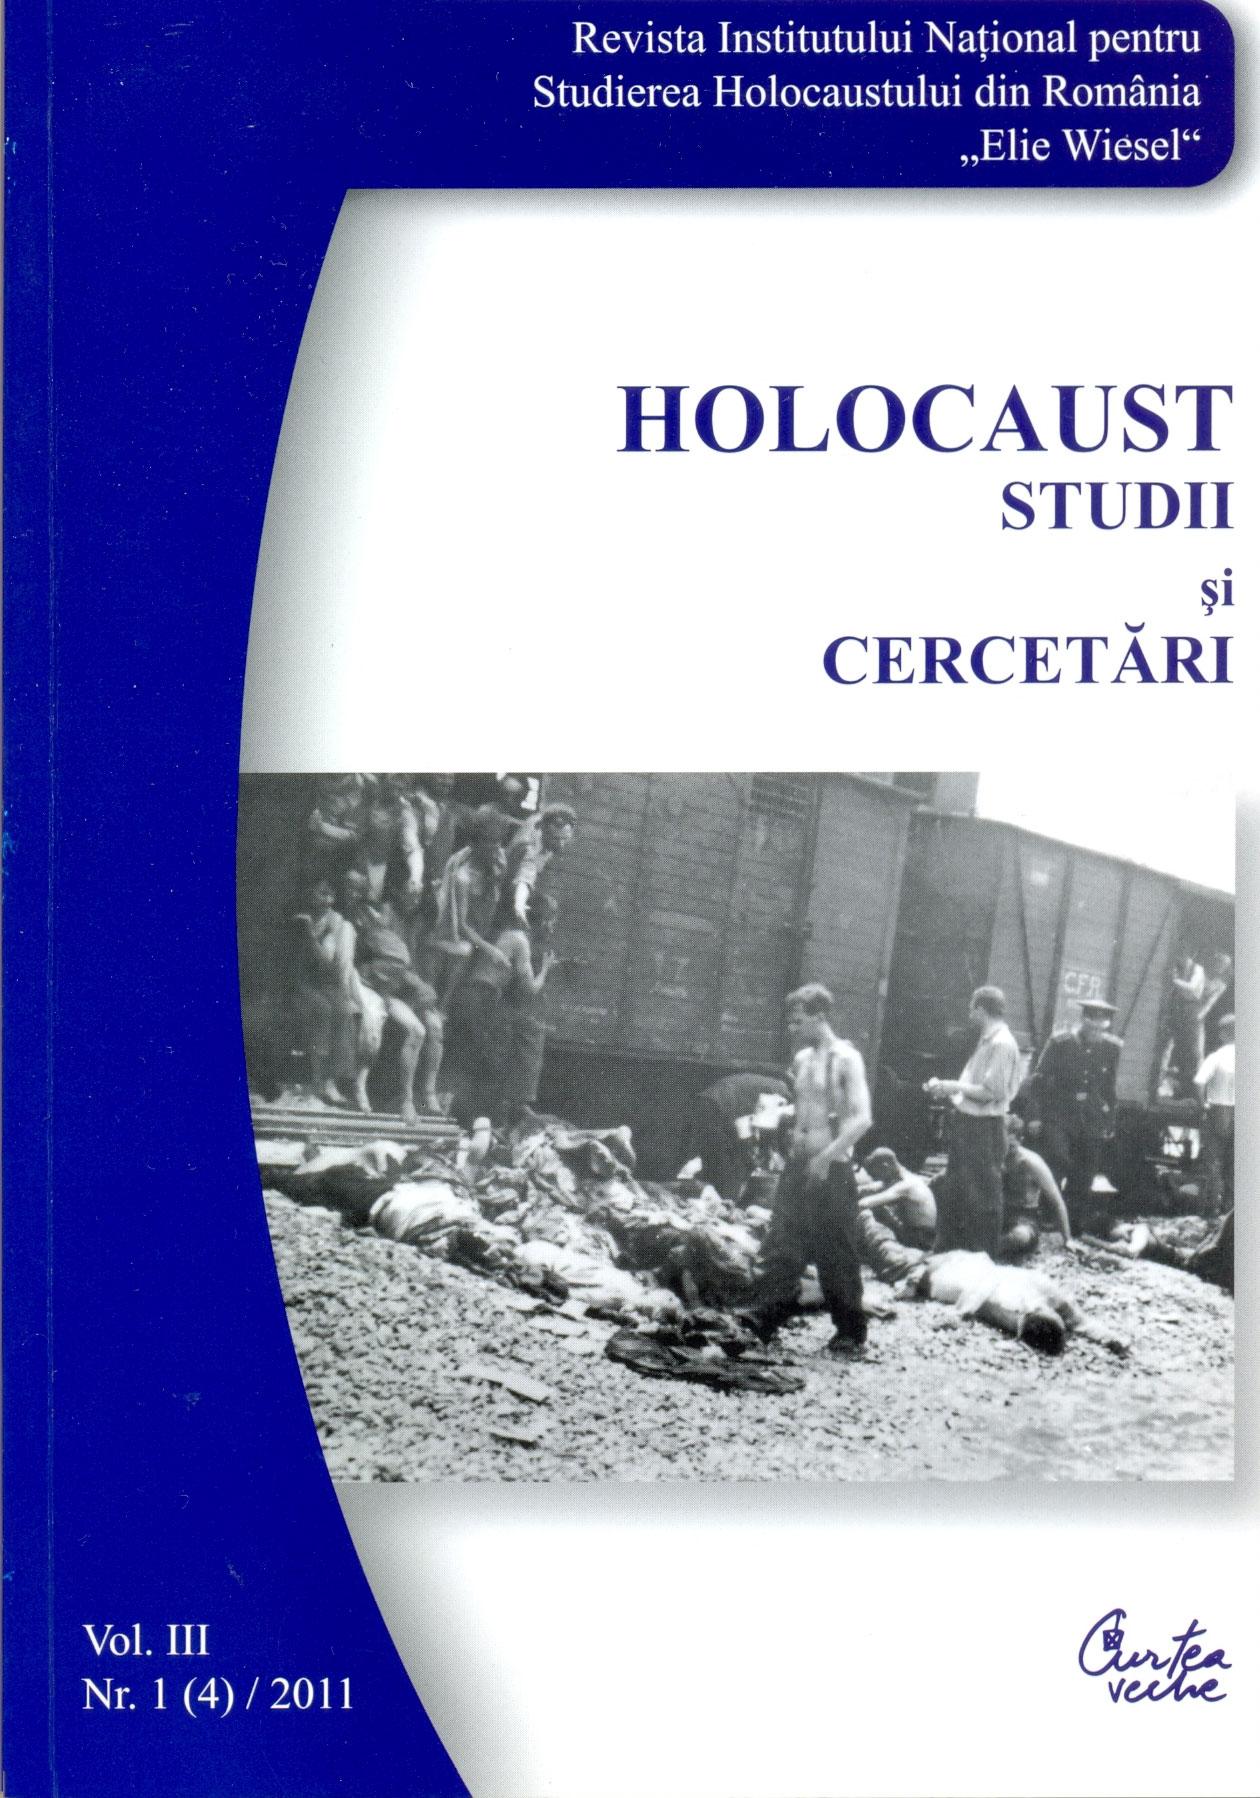 Revista INSHR Holocaust. Studii şi cercetări, vol. III, nr. 1(4)/2011